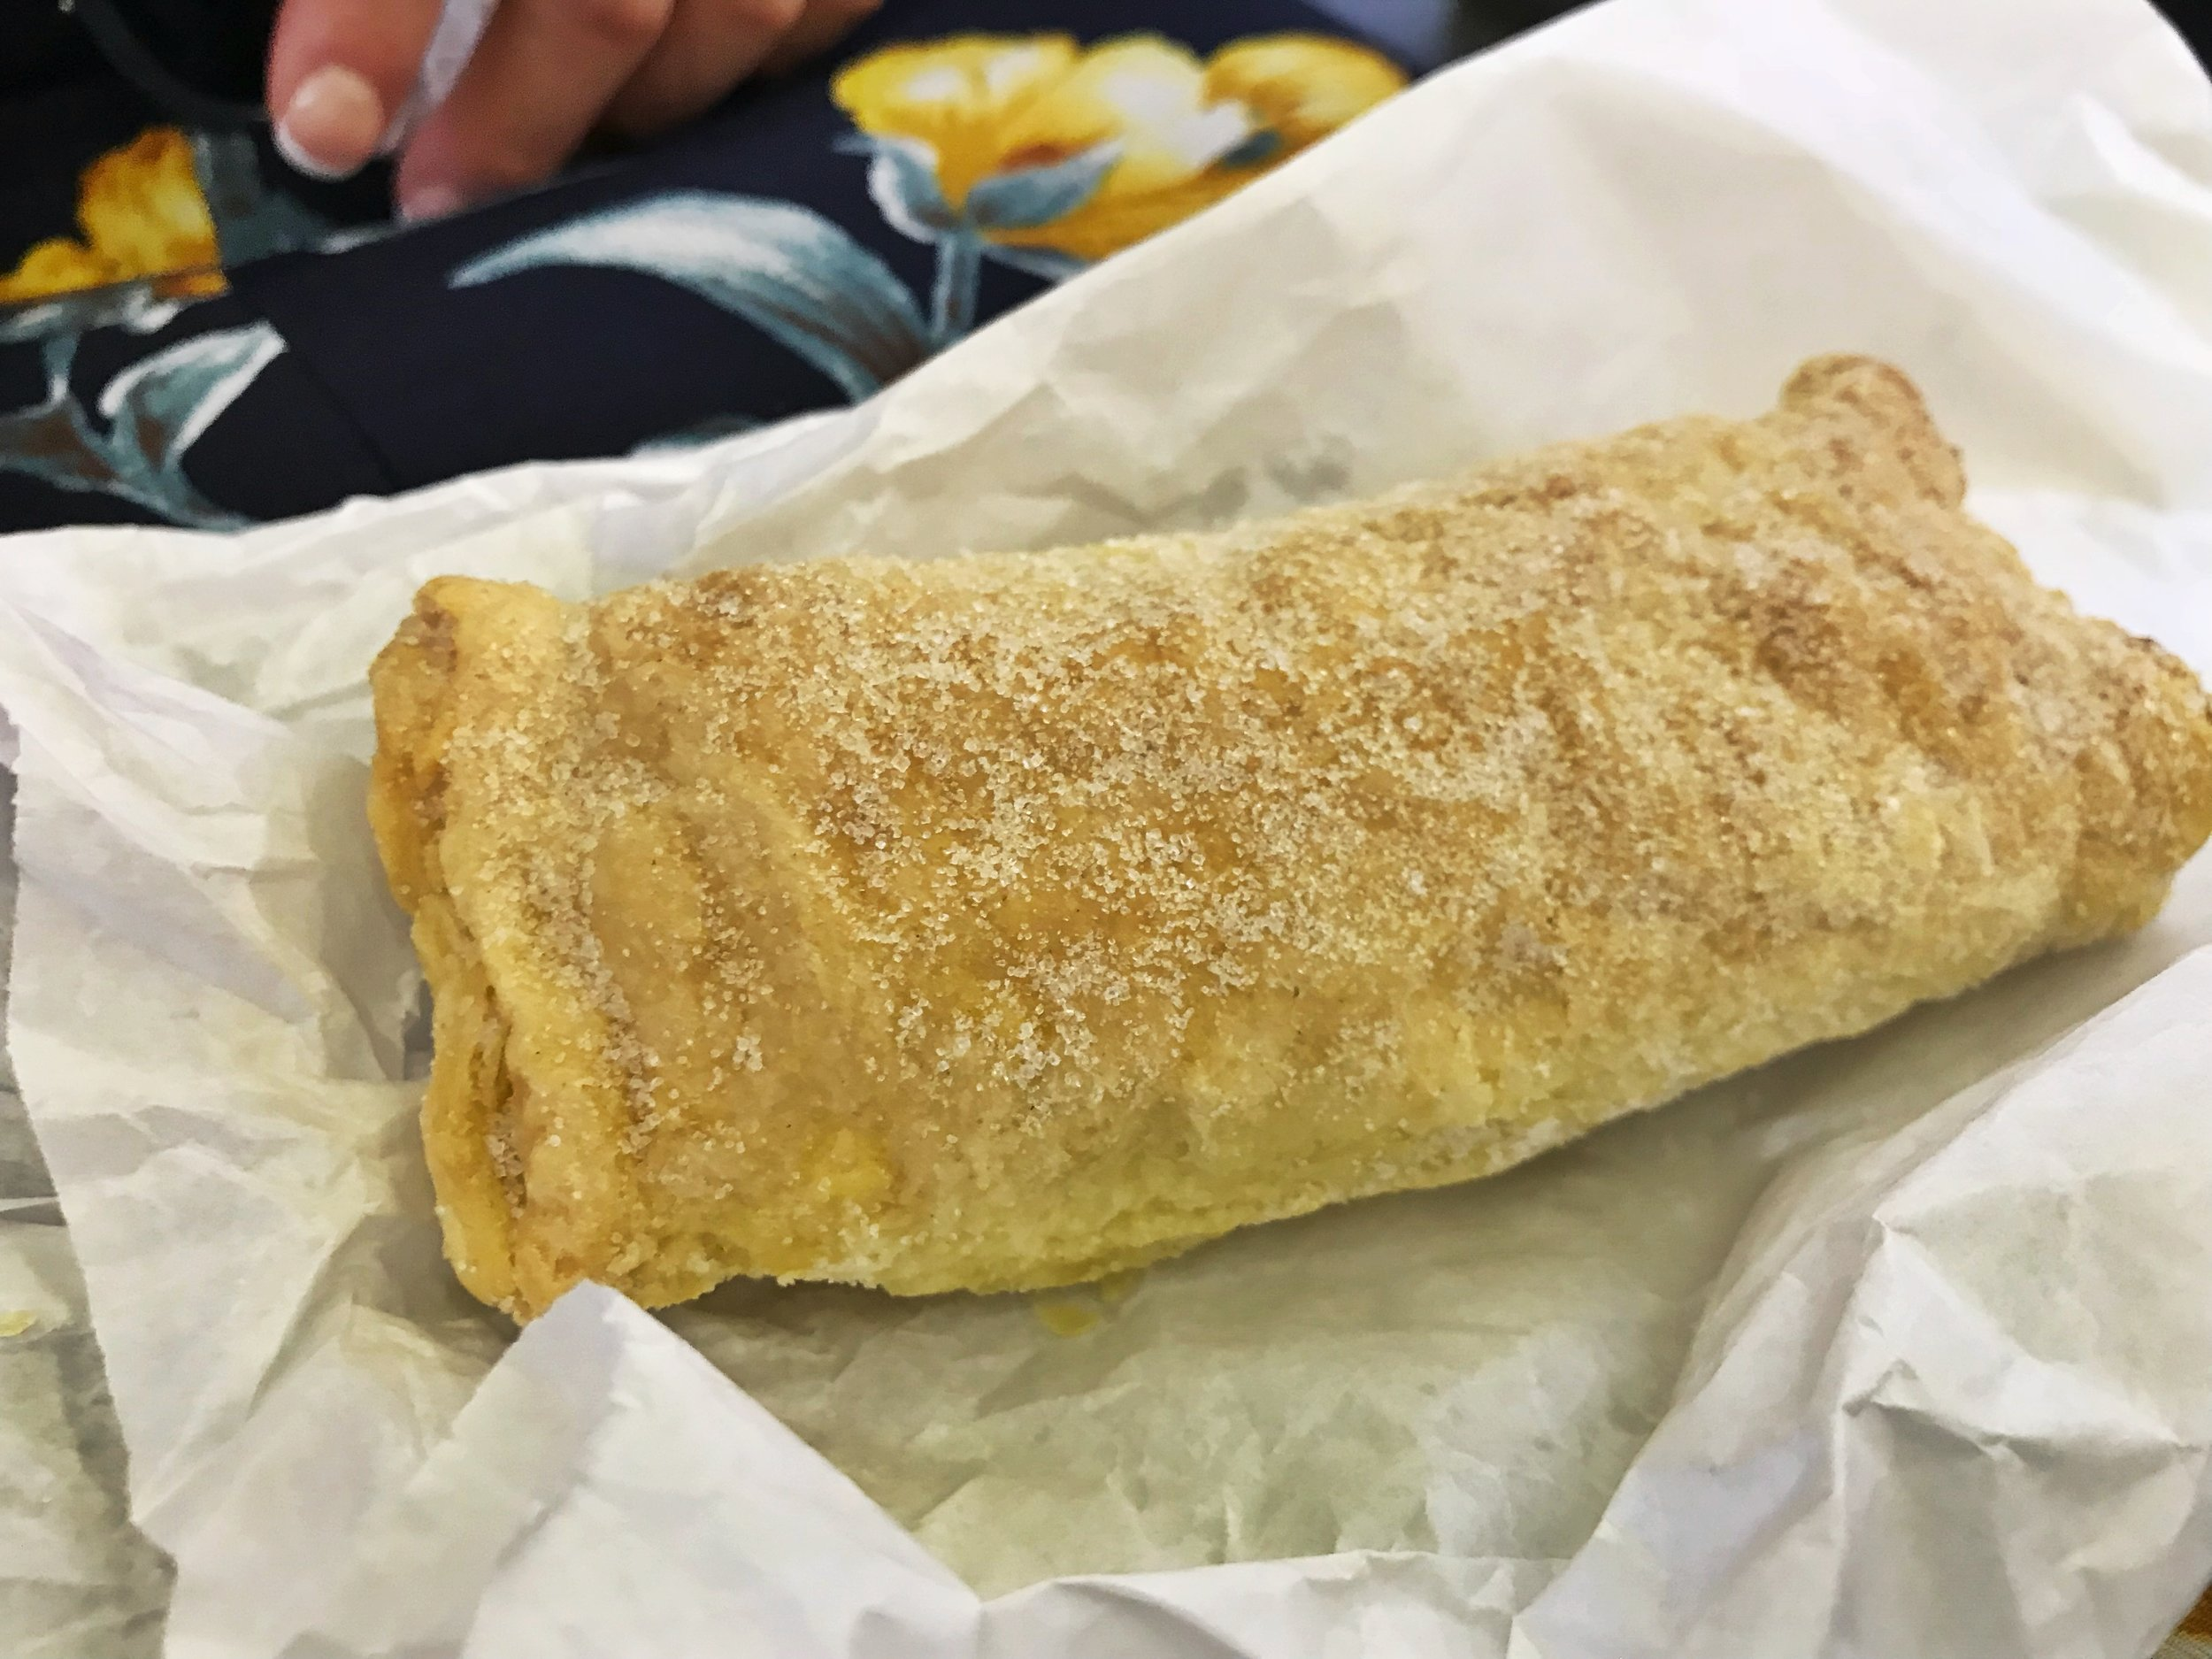 24hourkitchen-travel-guide-to-portuguese-pastries-pastelaria-lisbon-portugal-travesseiro-de-sintra